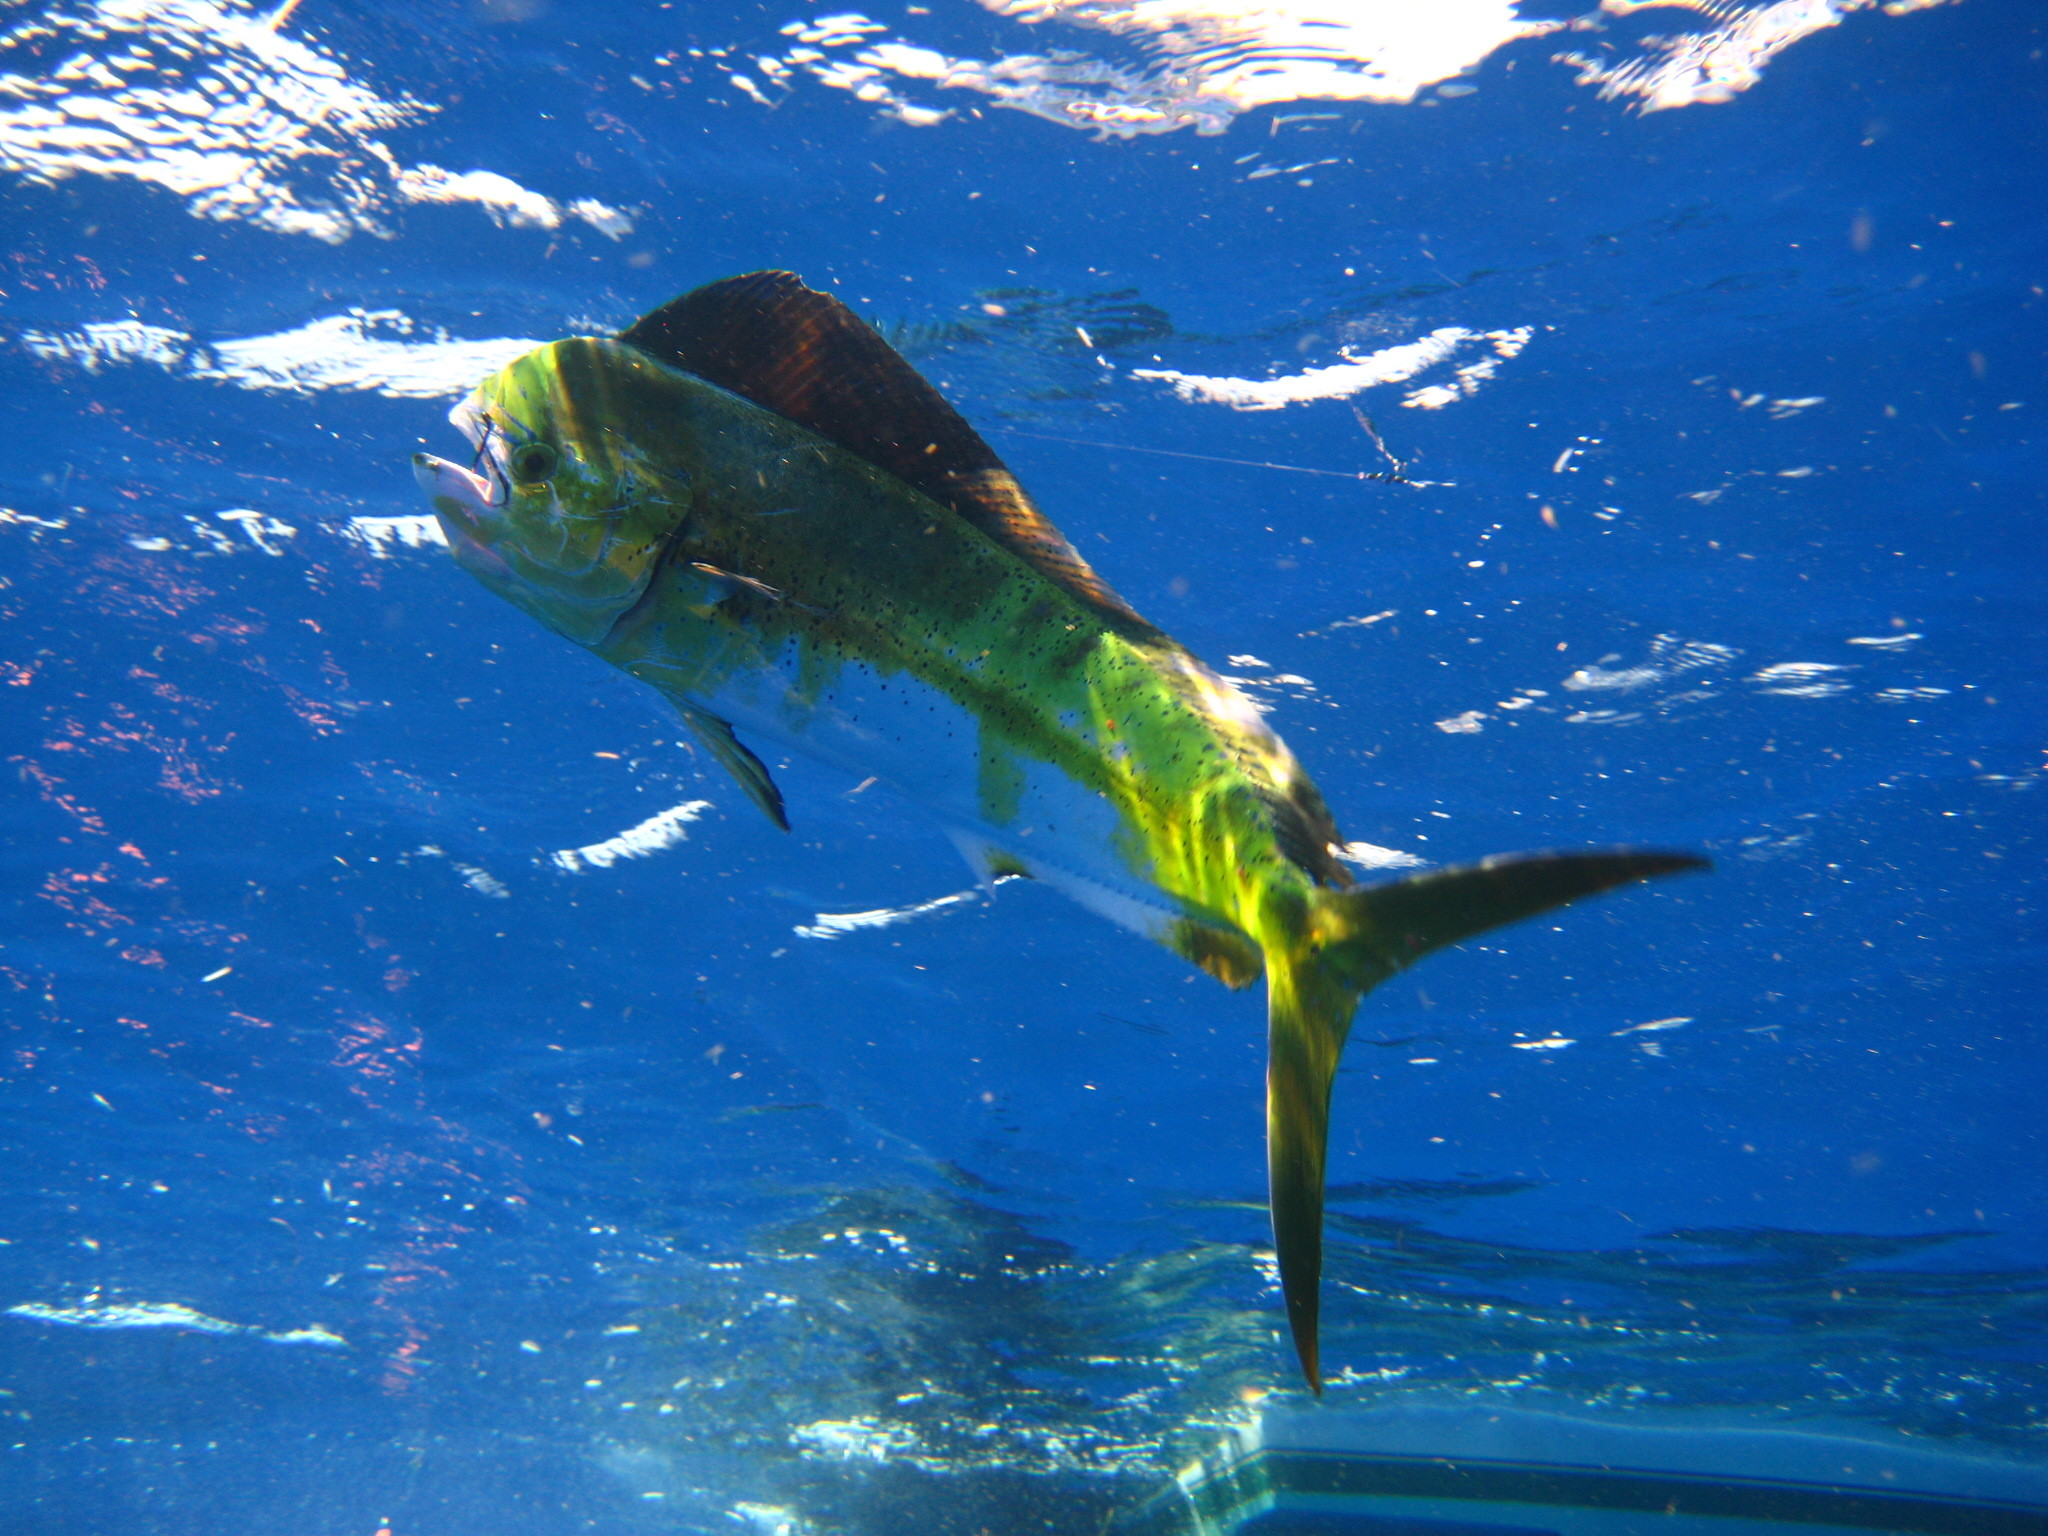 Res: 2048x1536, Fishing Types Islamorada Flats Fishing with Islamorada Fishing Guide